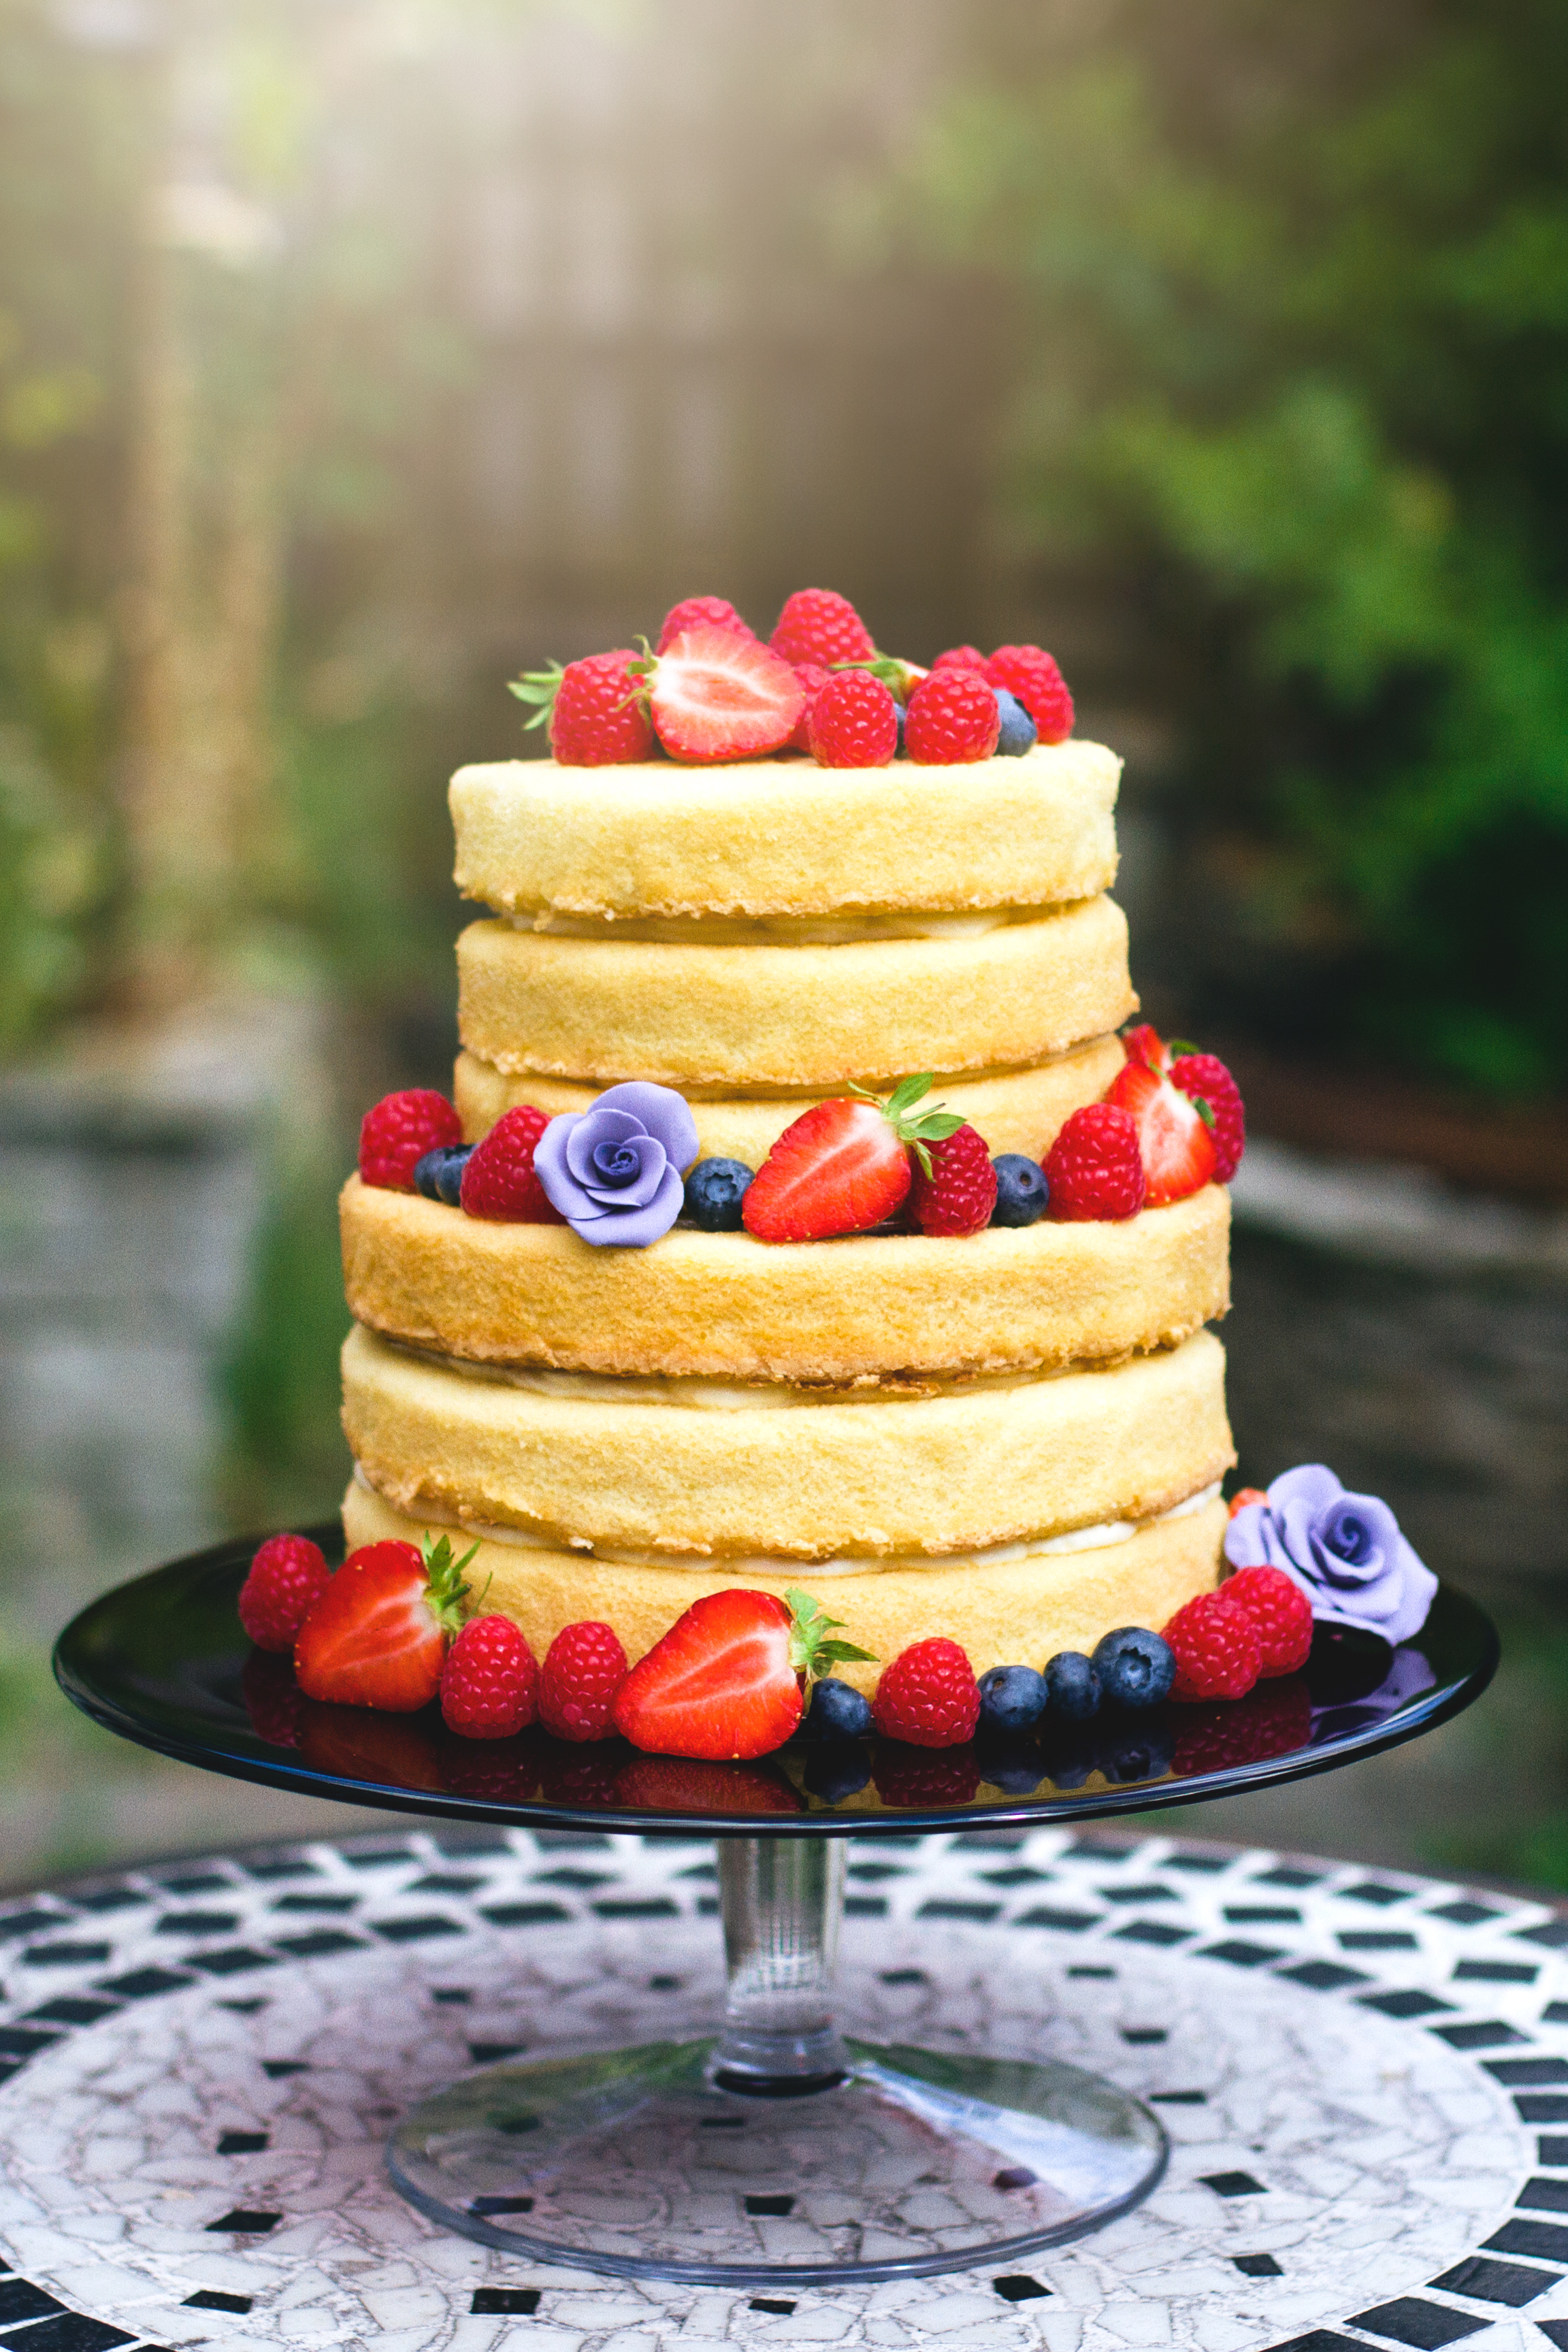 Naked wedding cake 2 tier gluten-free